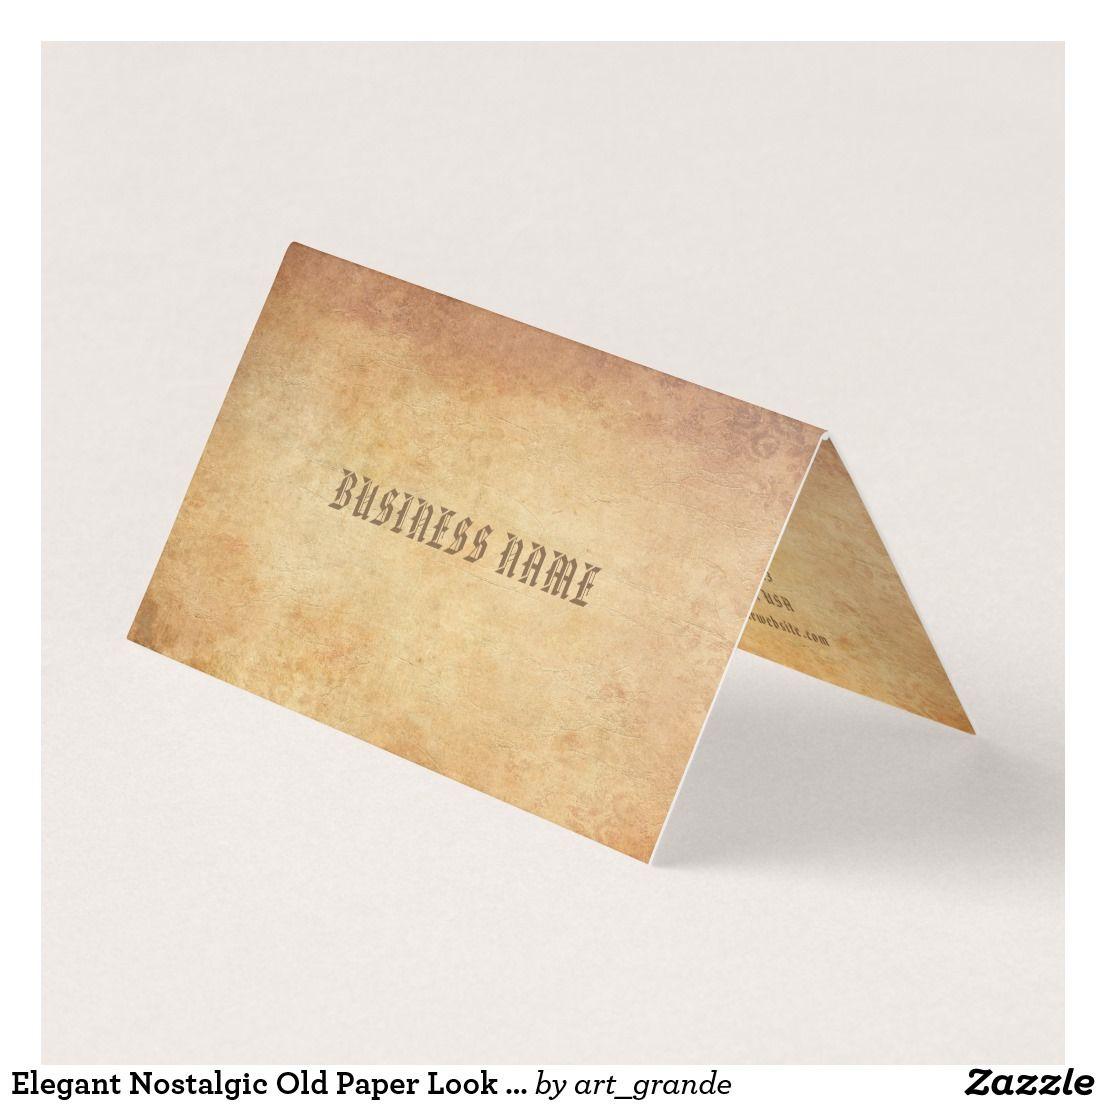 Elegant Nostalgic Old Paper Look Professional Cool Business